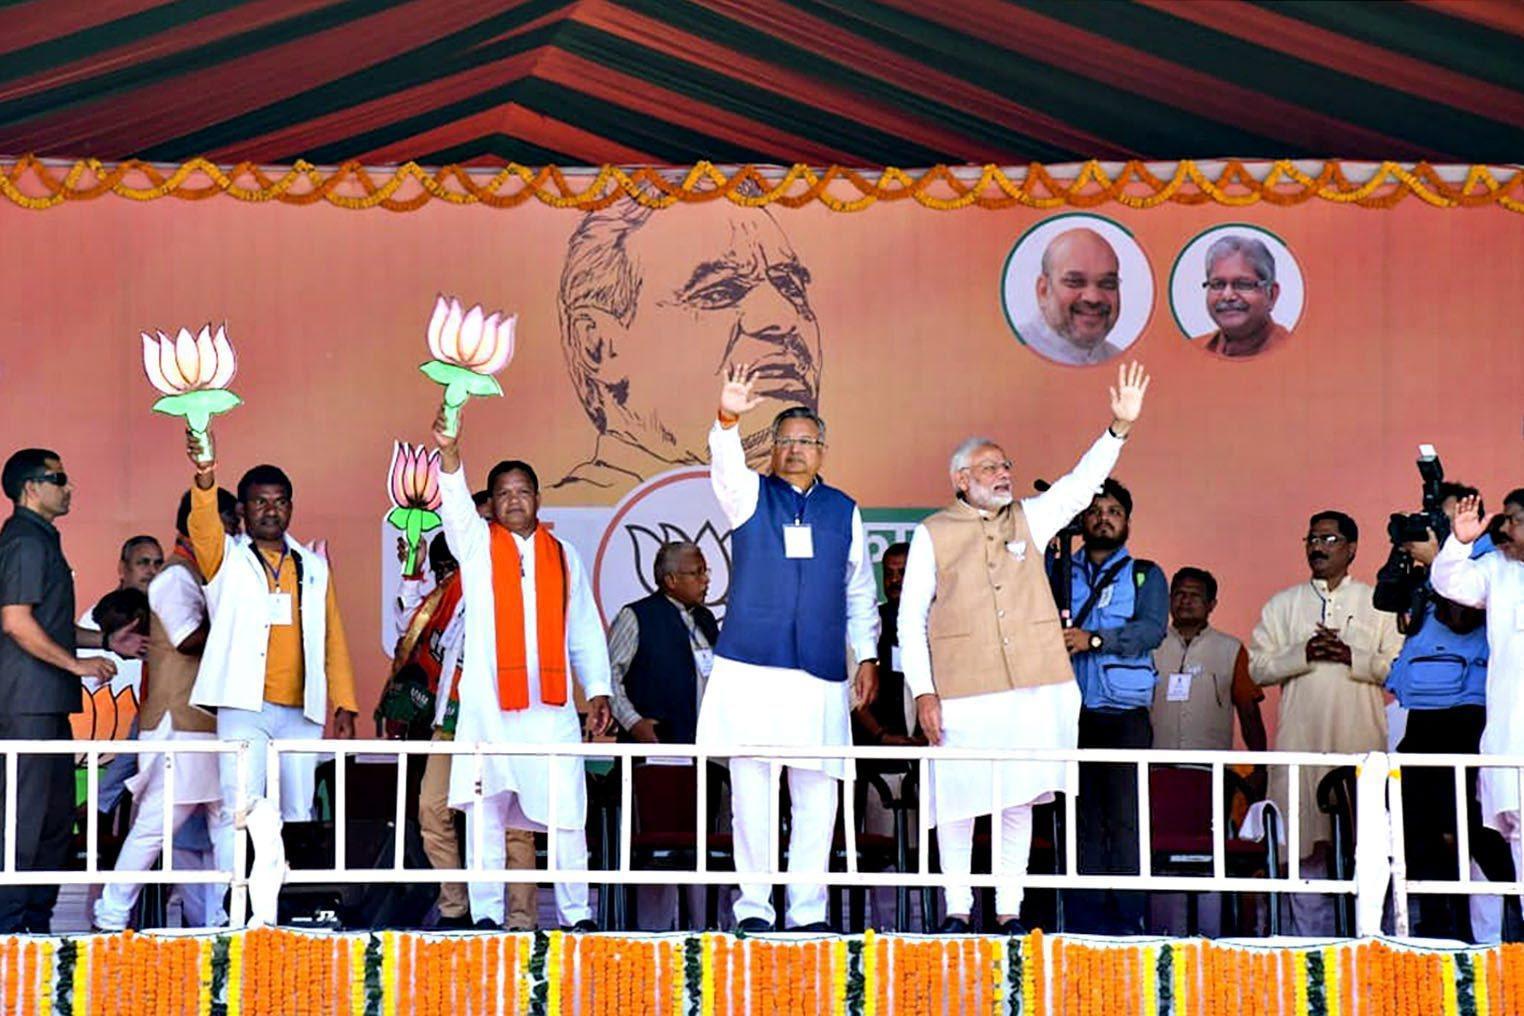 Prime Minister Narendra Modi during an election rally at Jagdalpur in Bastar district on November 9.